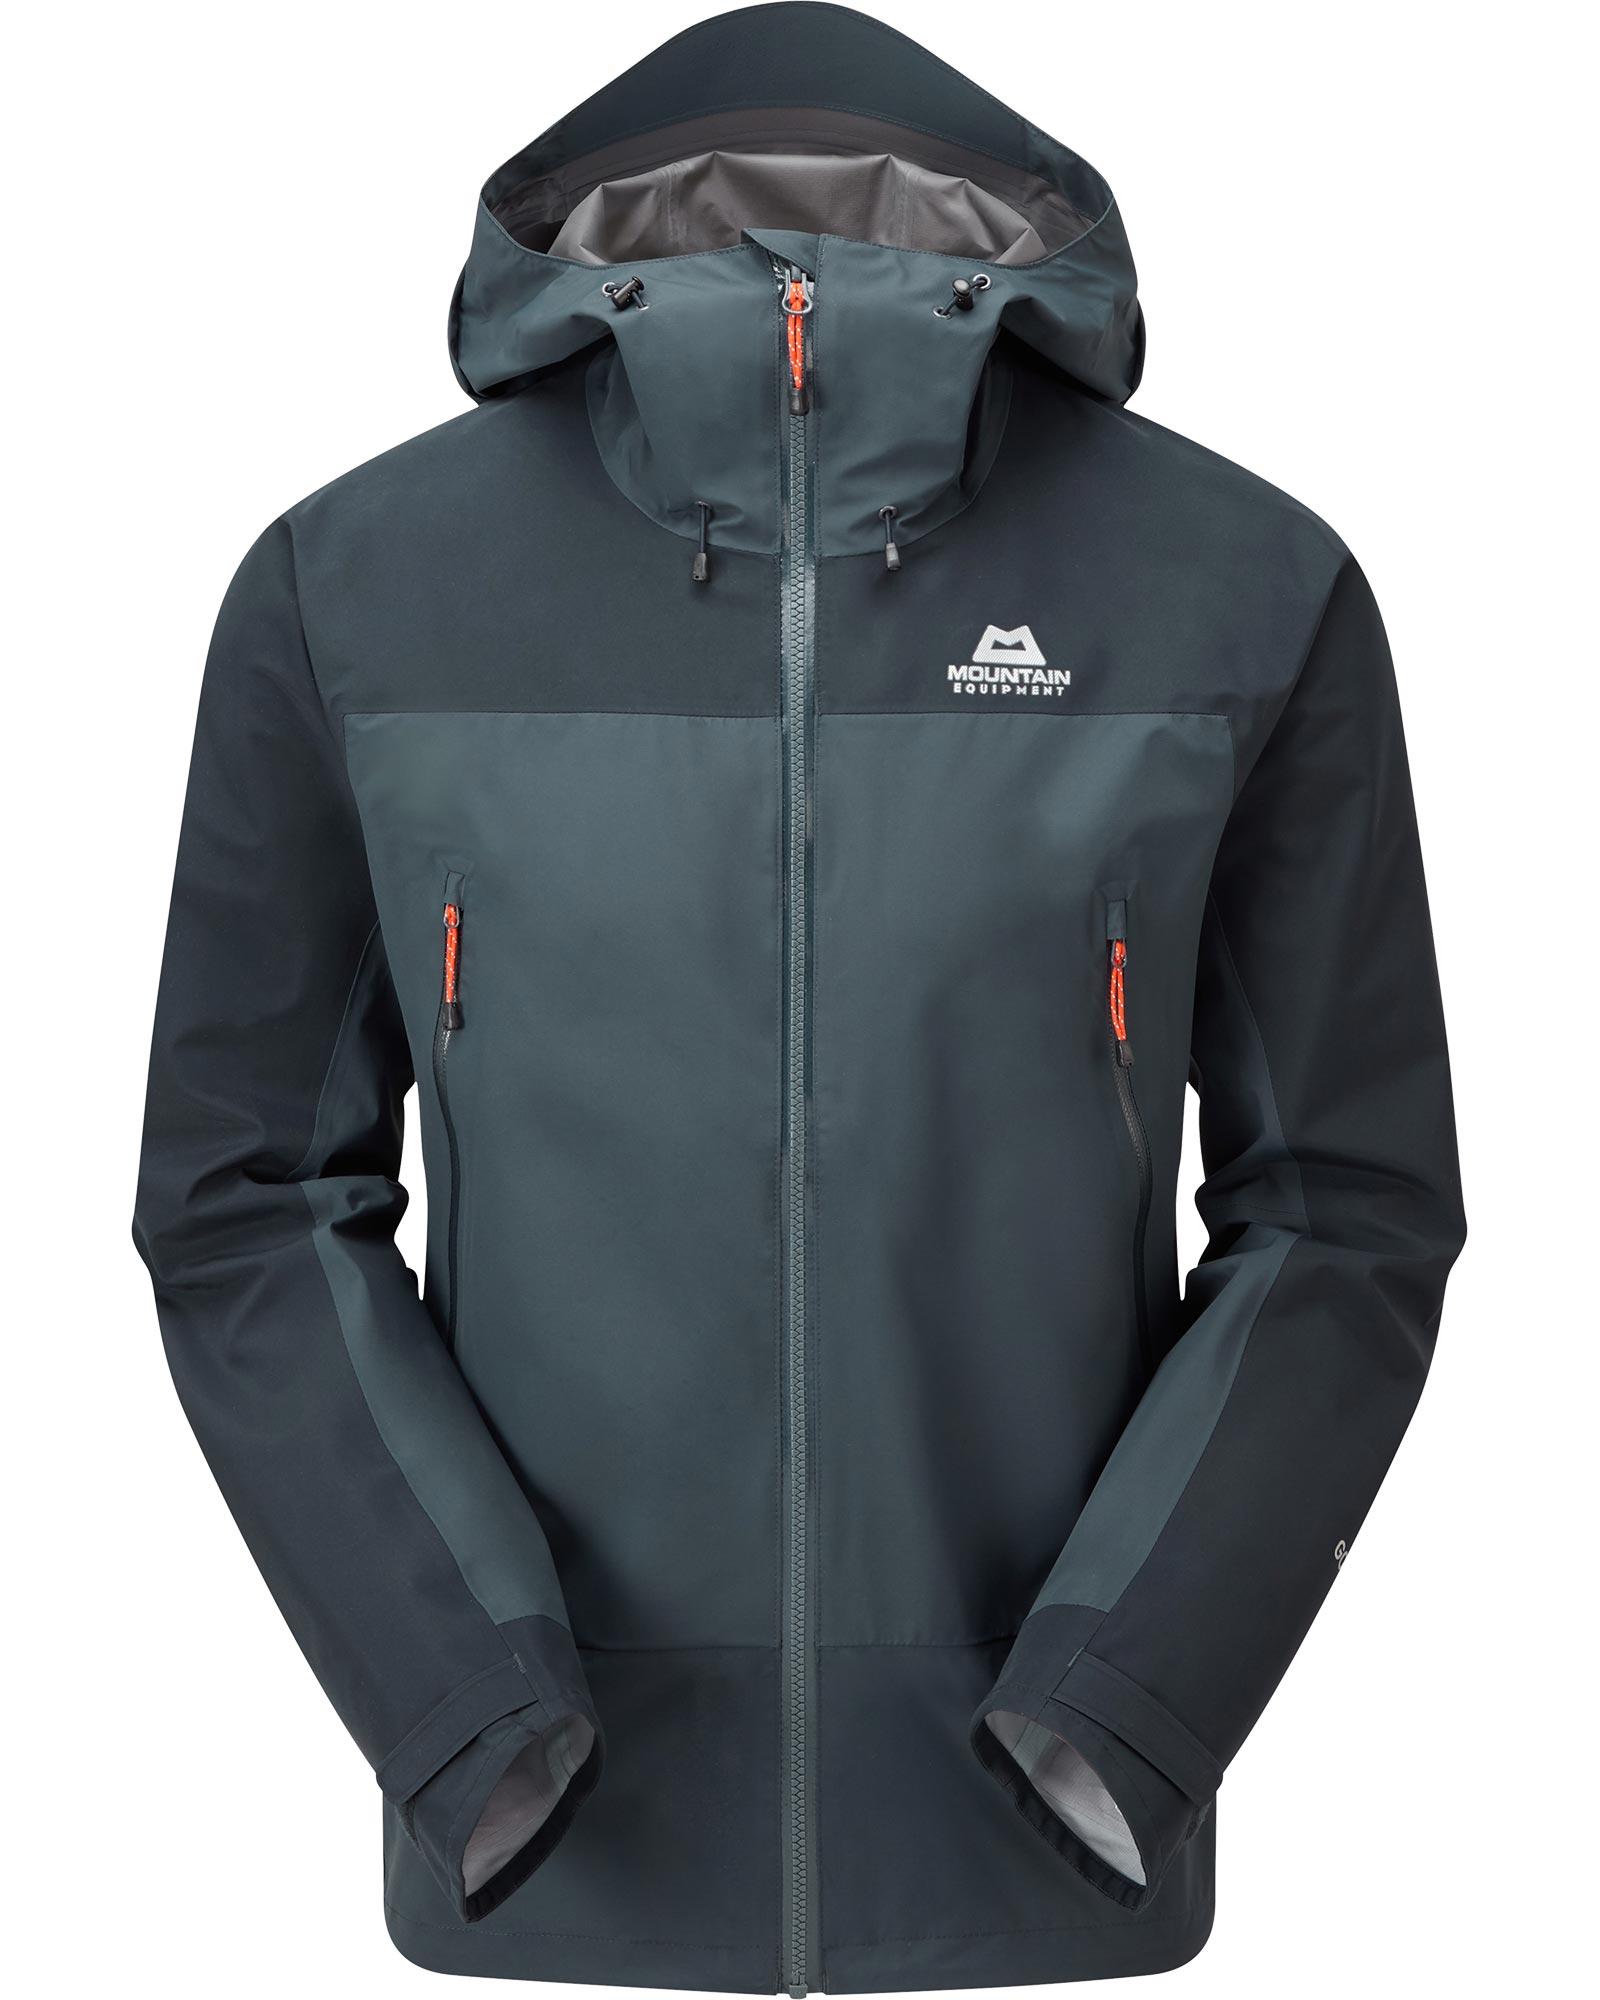 Mountain Equipment Men's Saltoro GORE-TEX PACLITE Plus Jacket 0